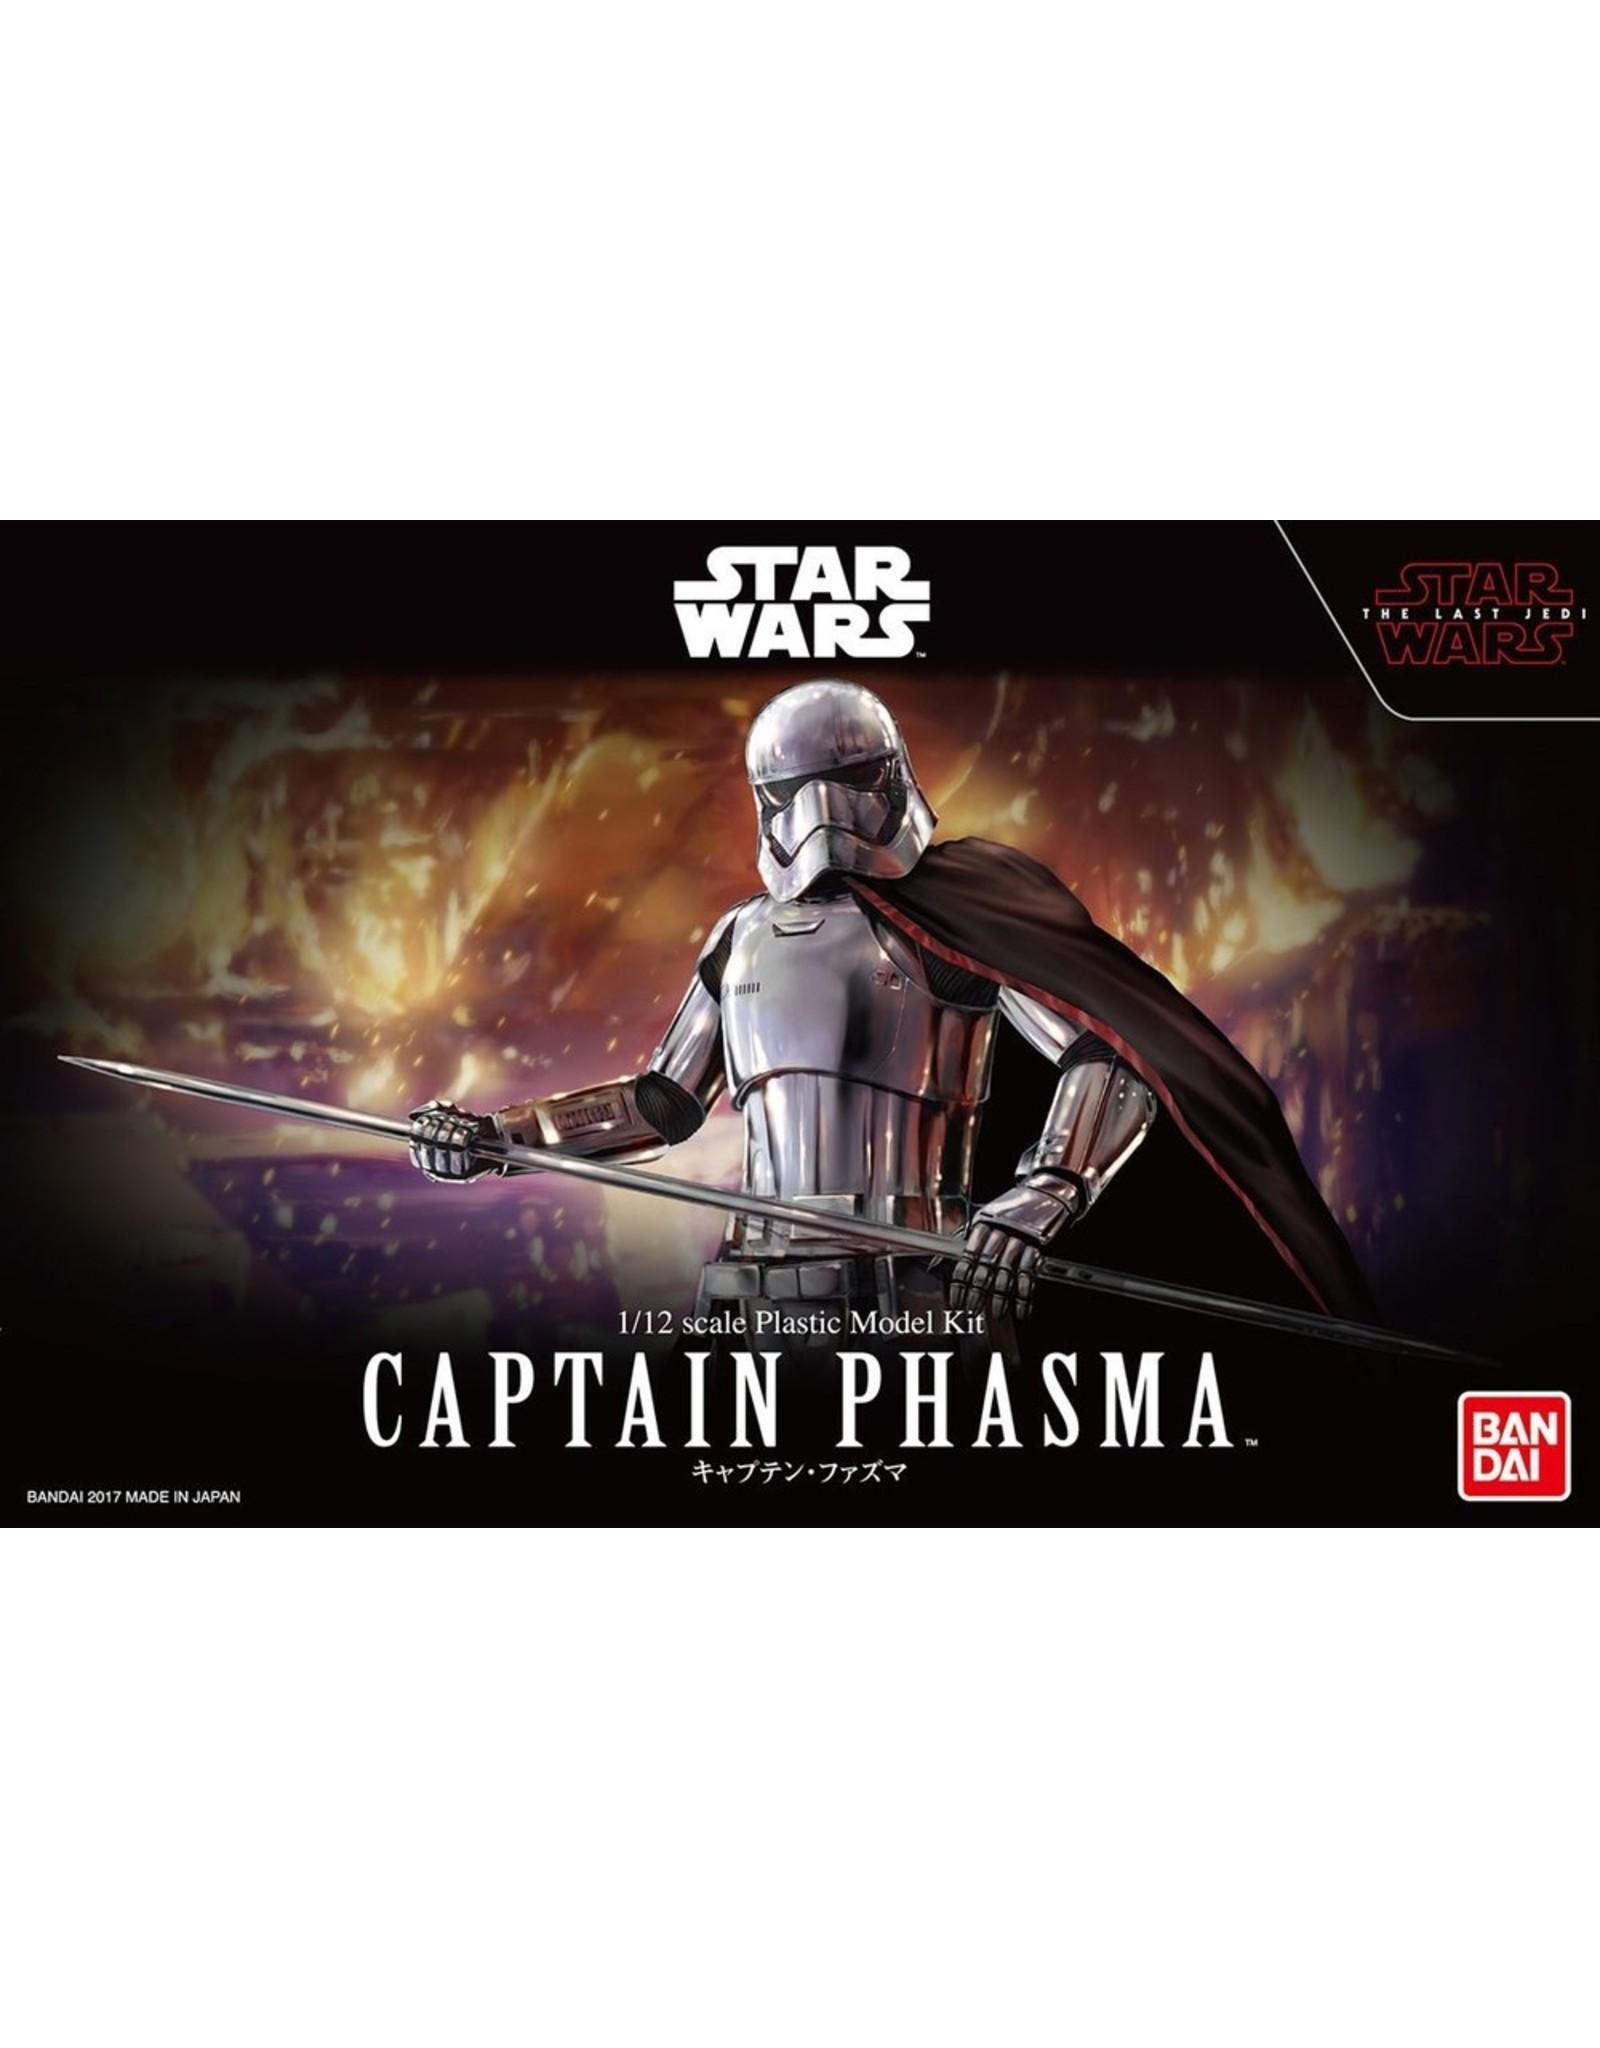 Japan The Last Jedi Bandai 1//12 Plastic Model Kit Star Wars Captain Phasma